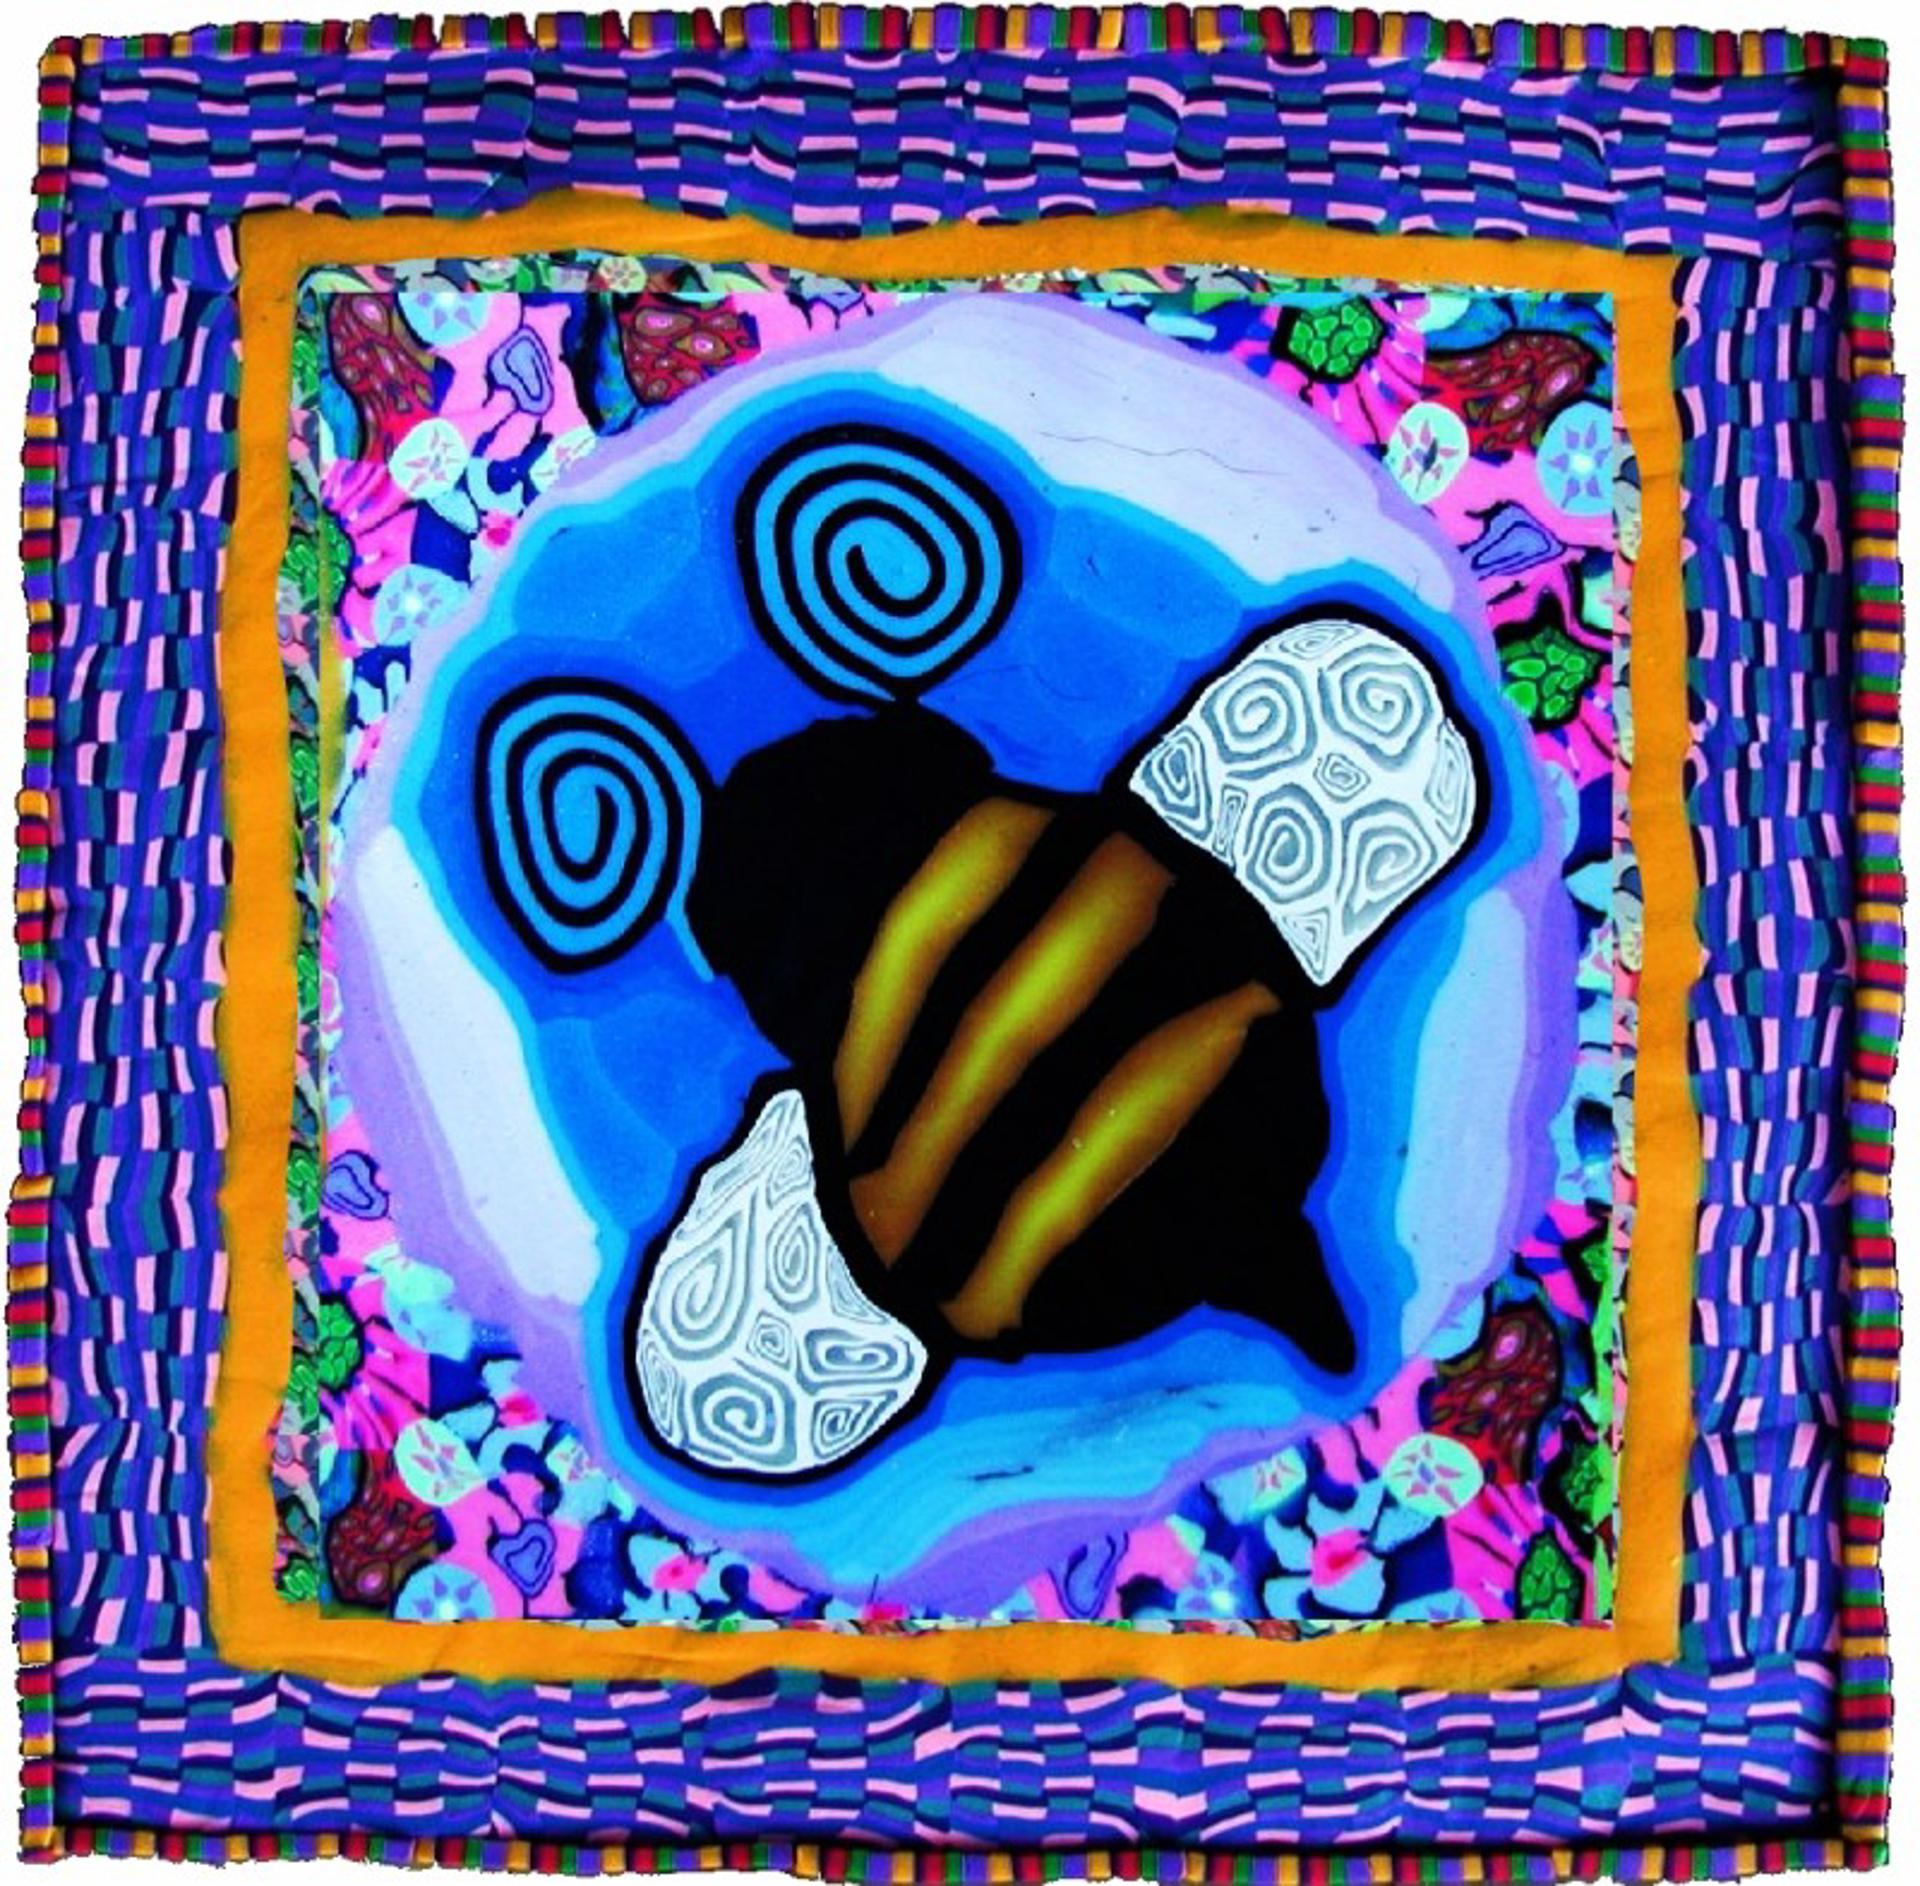 Bee by Samantha Long - Prints